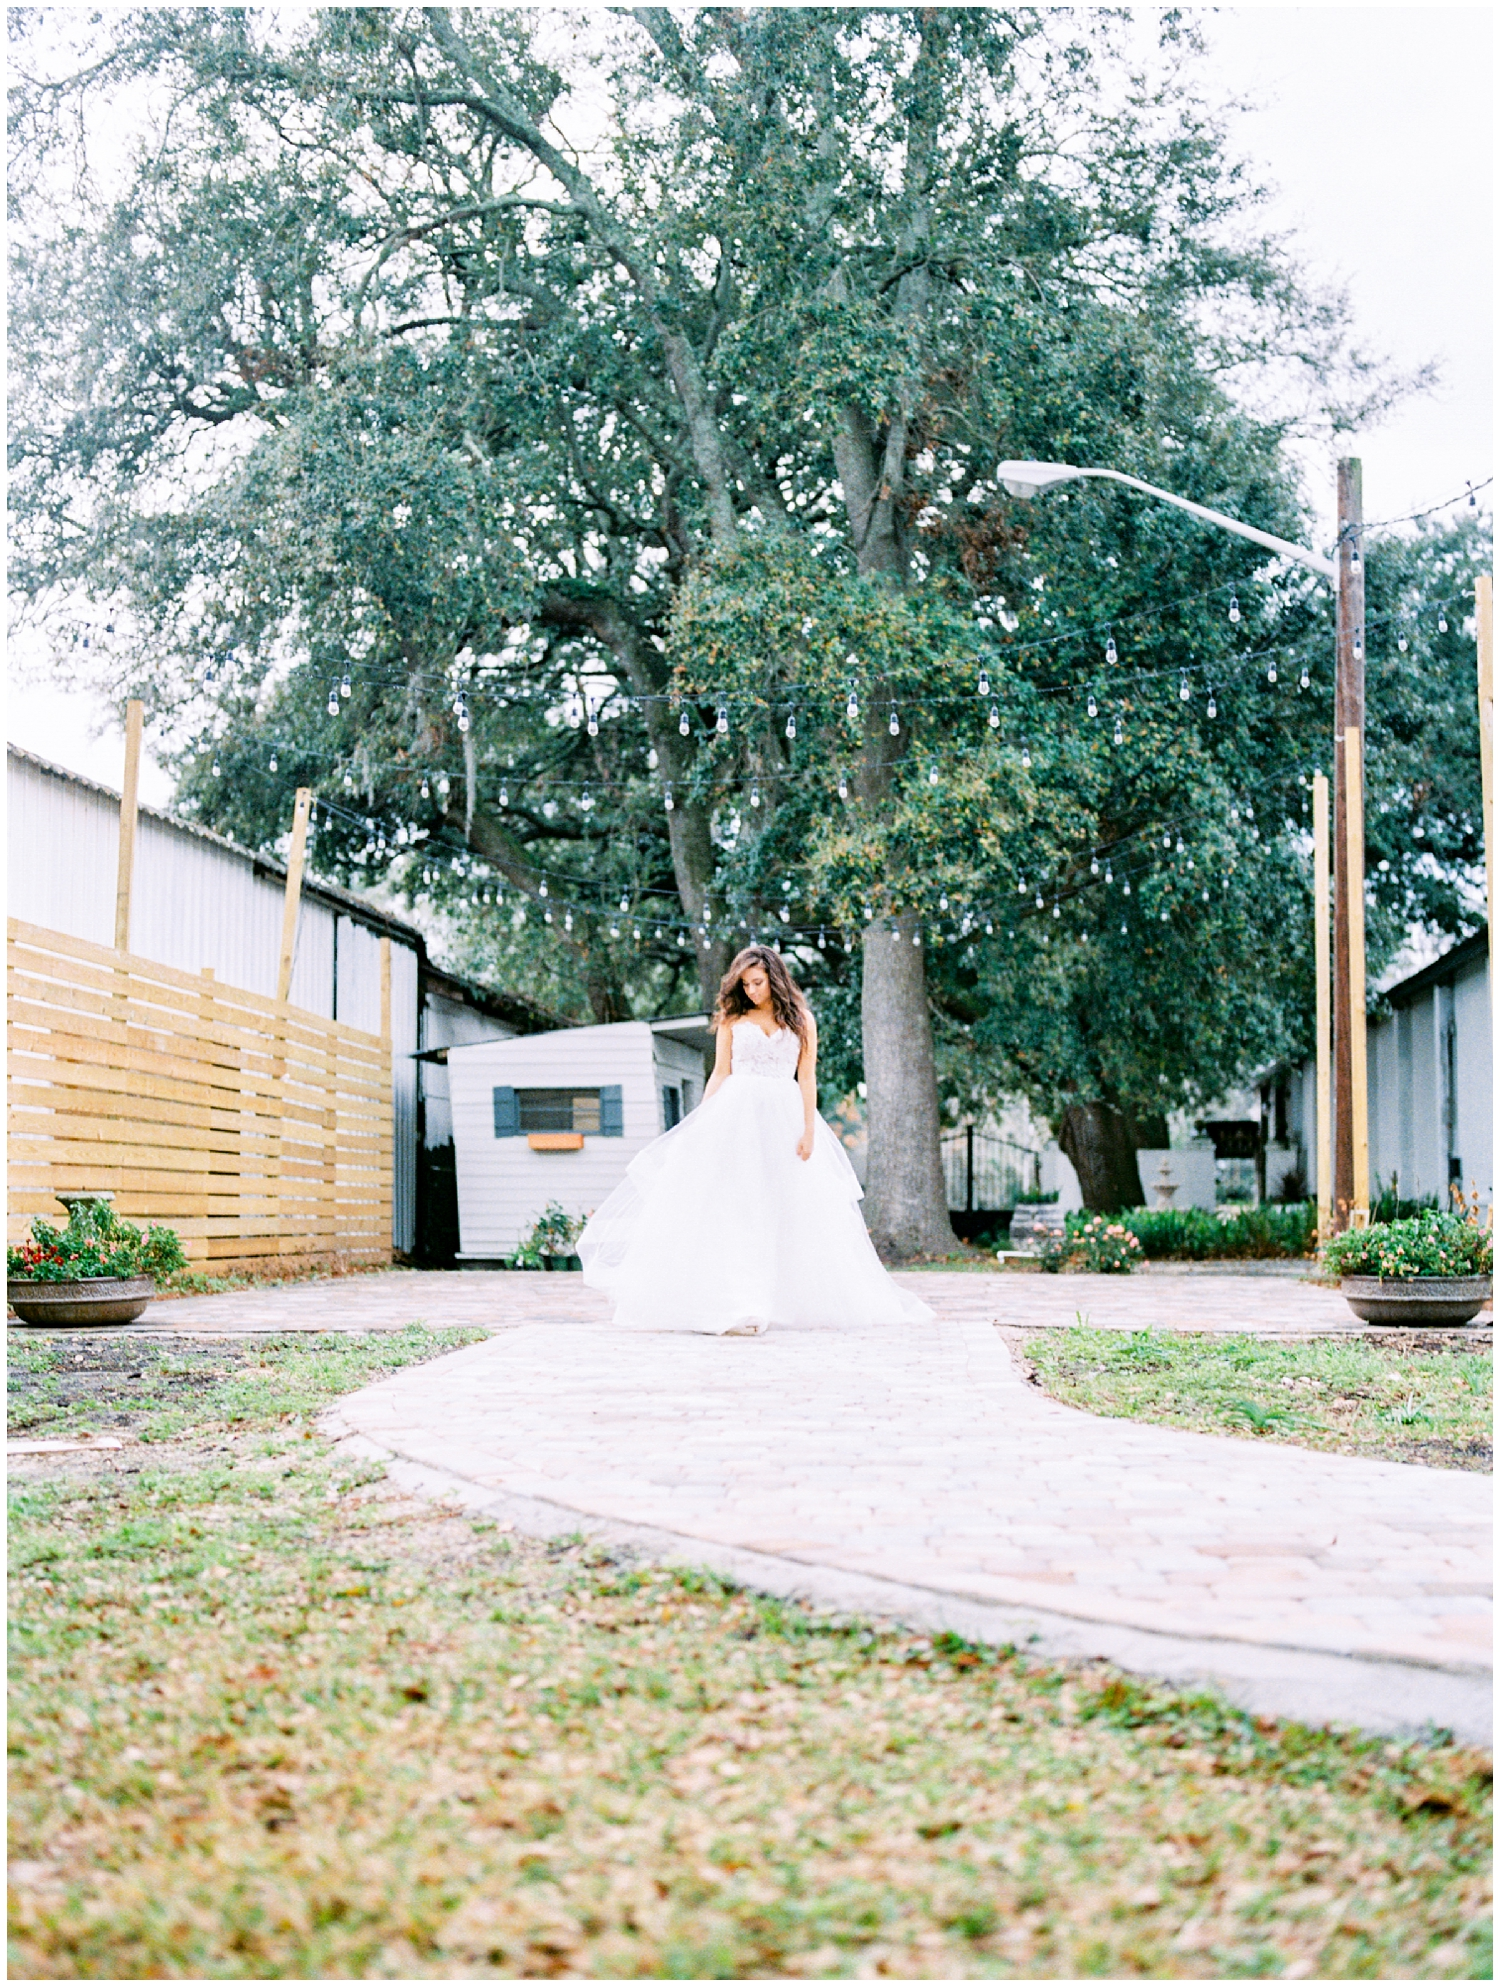 Lisa Silva Photography- Ponte Vedra Beach and Jacksonville, Florida Fine Art Film Wedding Photography- Spring Bridal Shoot at Ellie's Garden in San Marco, Jacksonville_0027.jpg